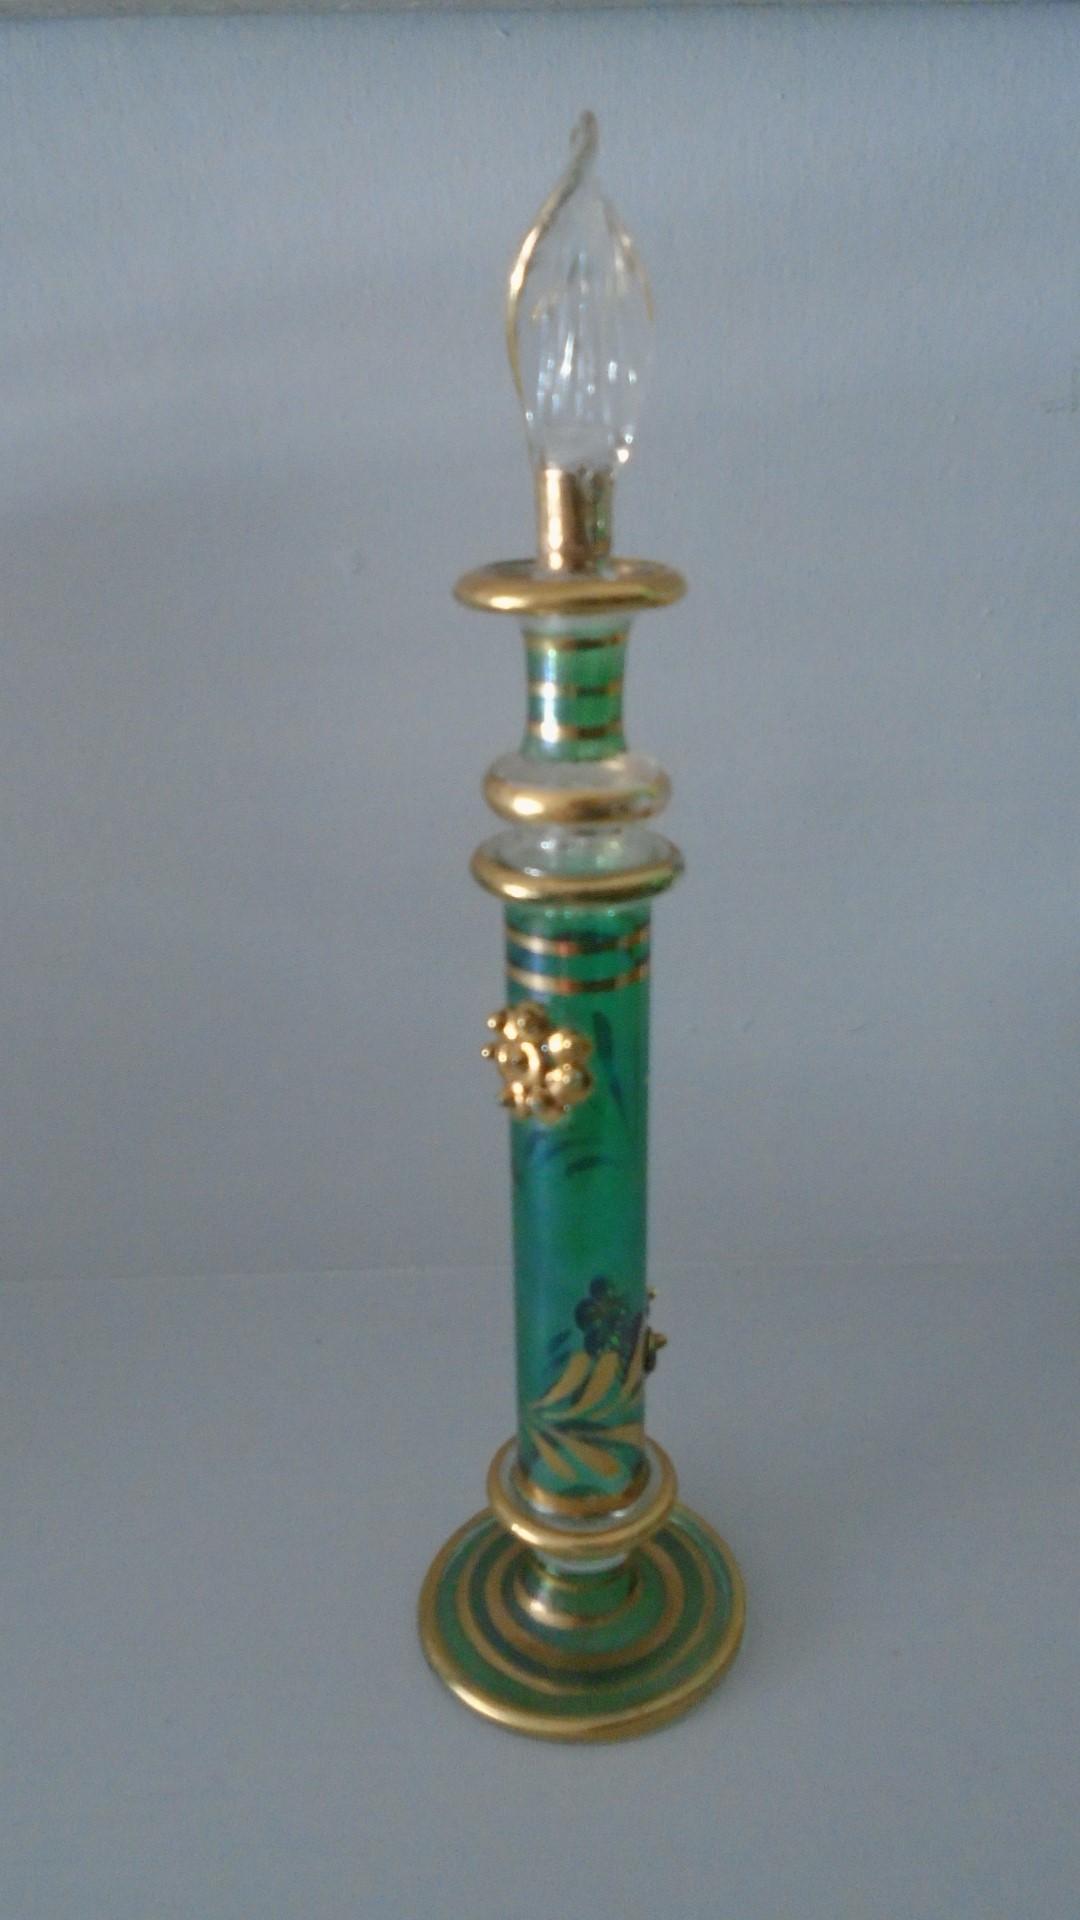 19.5cms high pretty glass perfume bottle